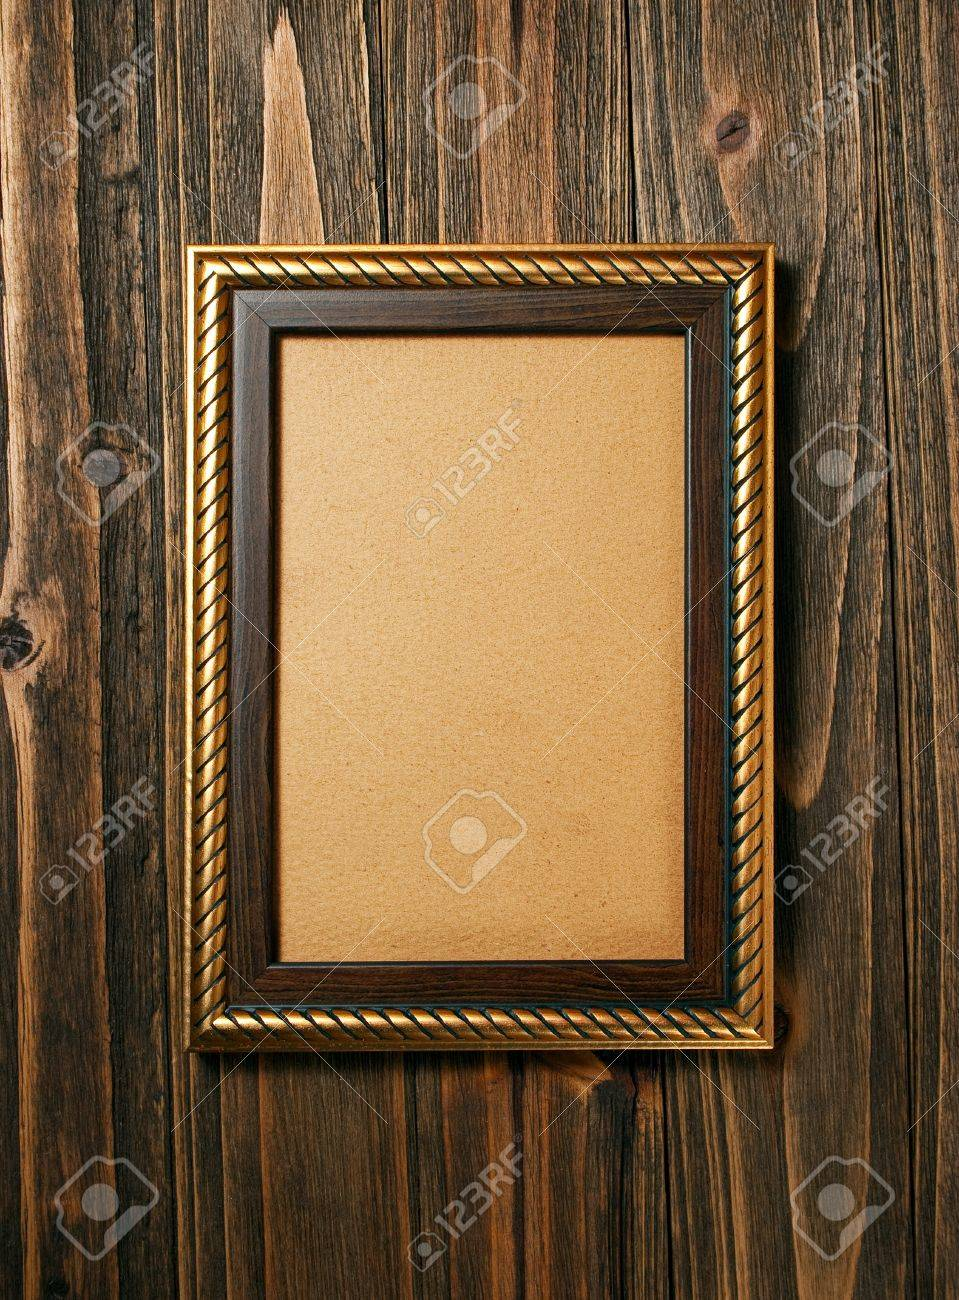 ancient style golden photo image frame on wood background Stock Photo - 12464664